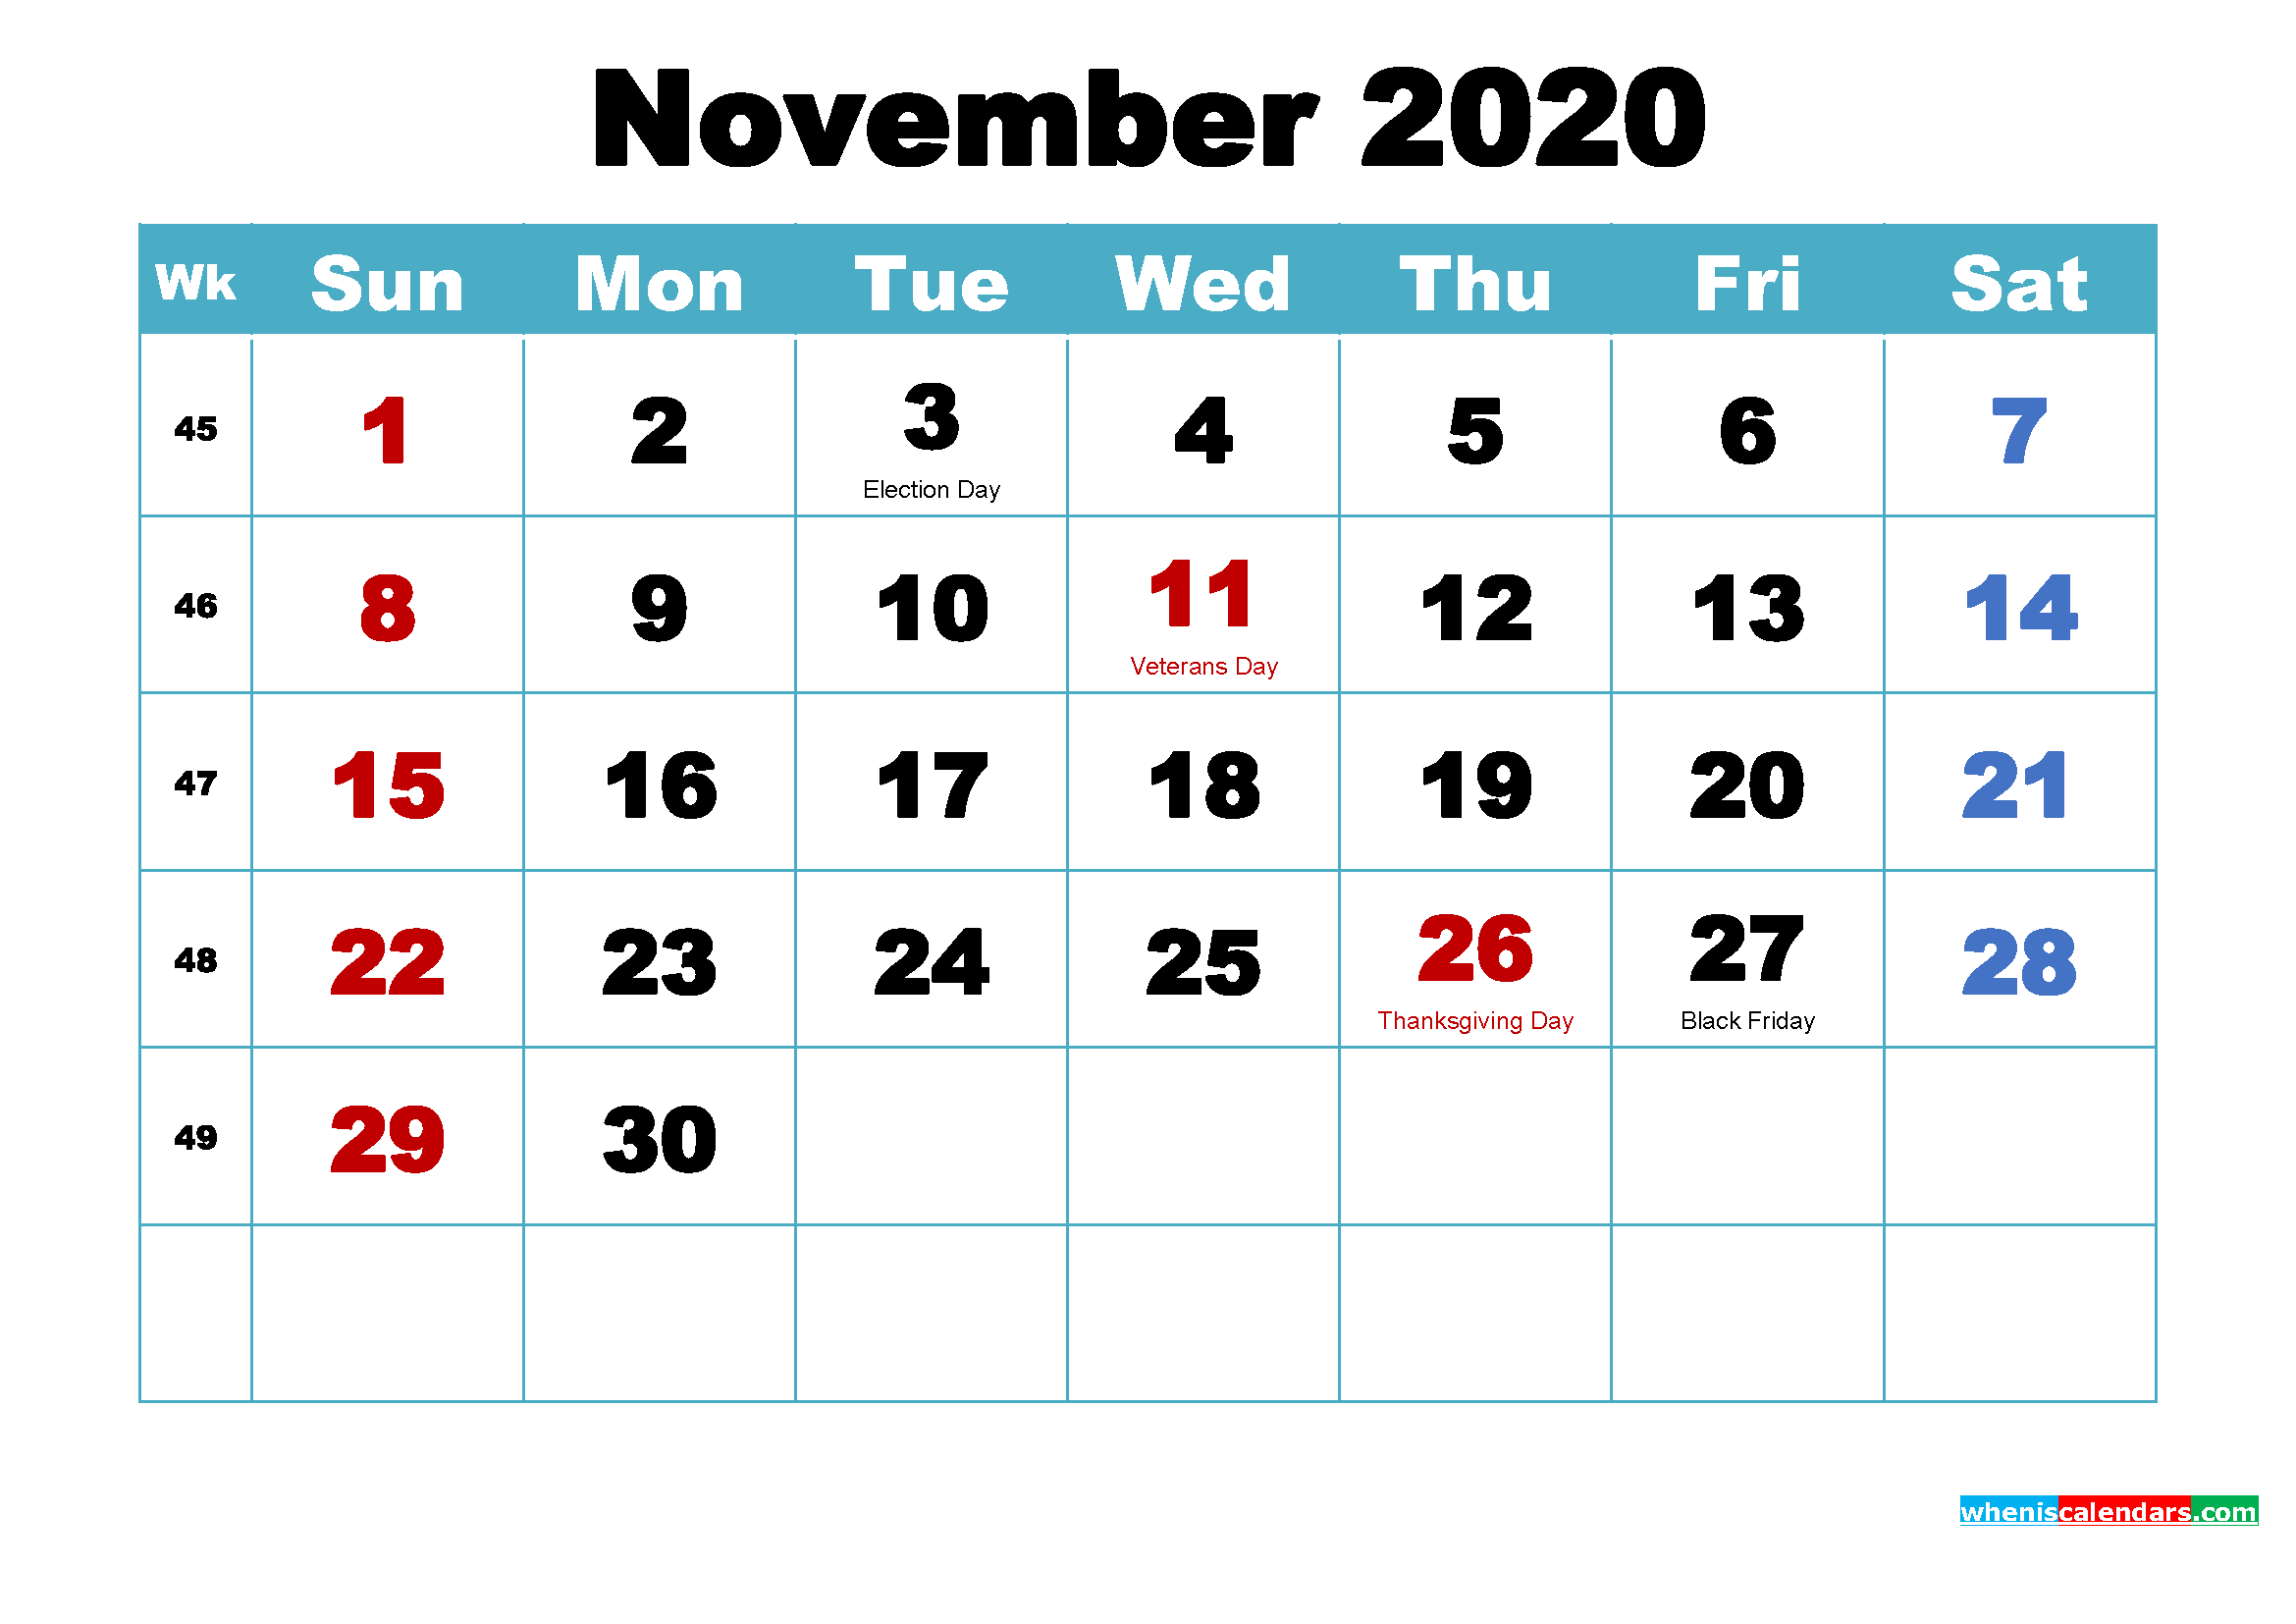 November 2020 Calendar Wallpaper Free Download